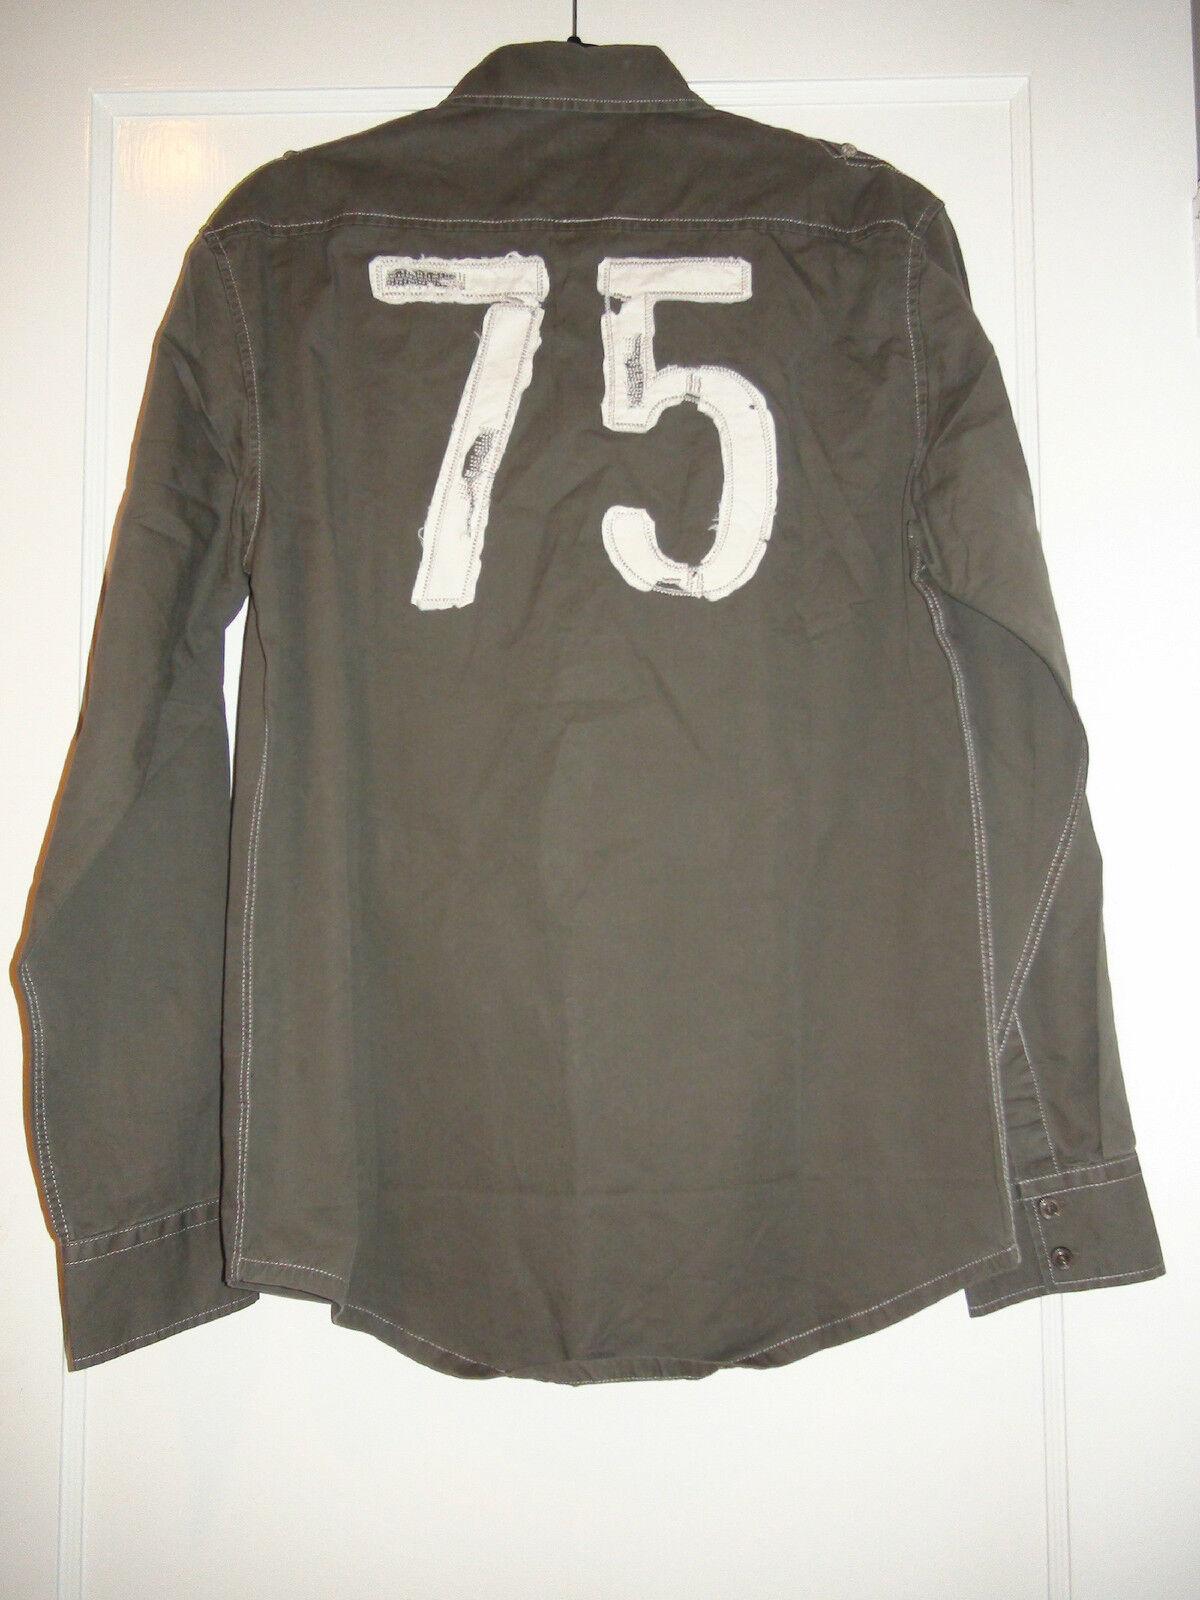 773a0dbf7 Men's 7 Diamonds Freestyle Long Sleeve Olive Green Casual Shirt NWT Sz L 2XL